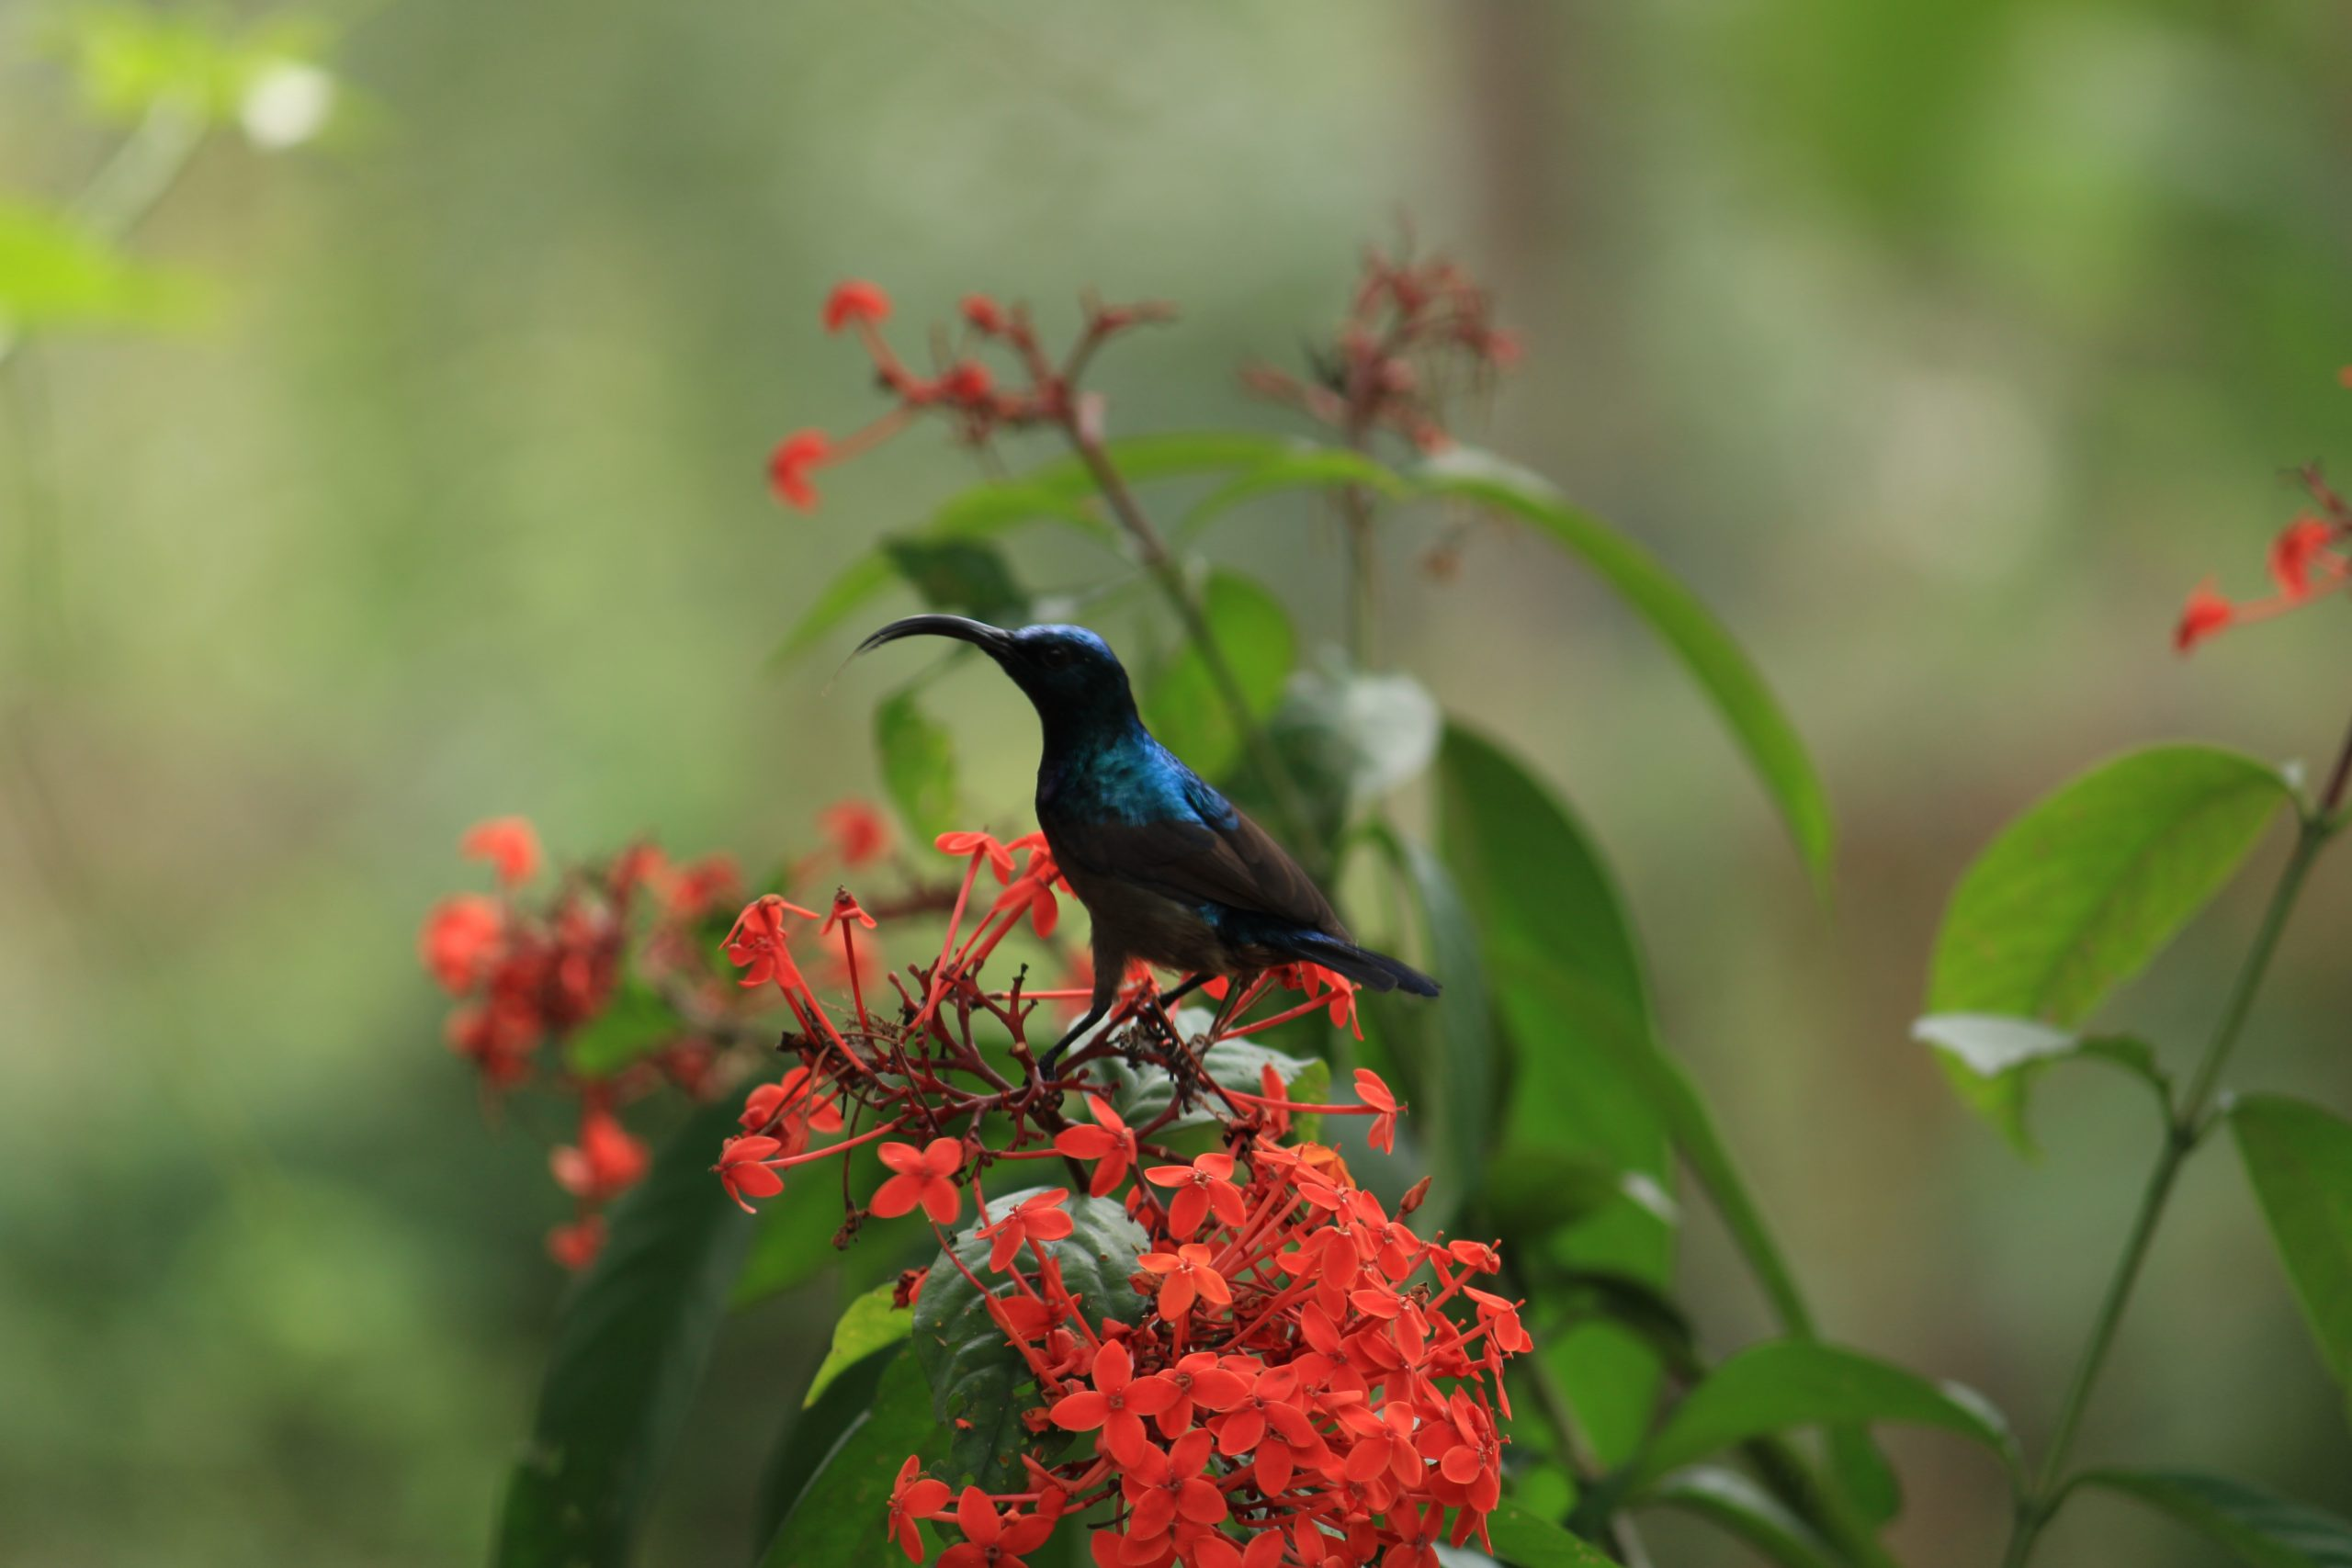 A bird sitting on the flower